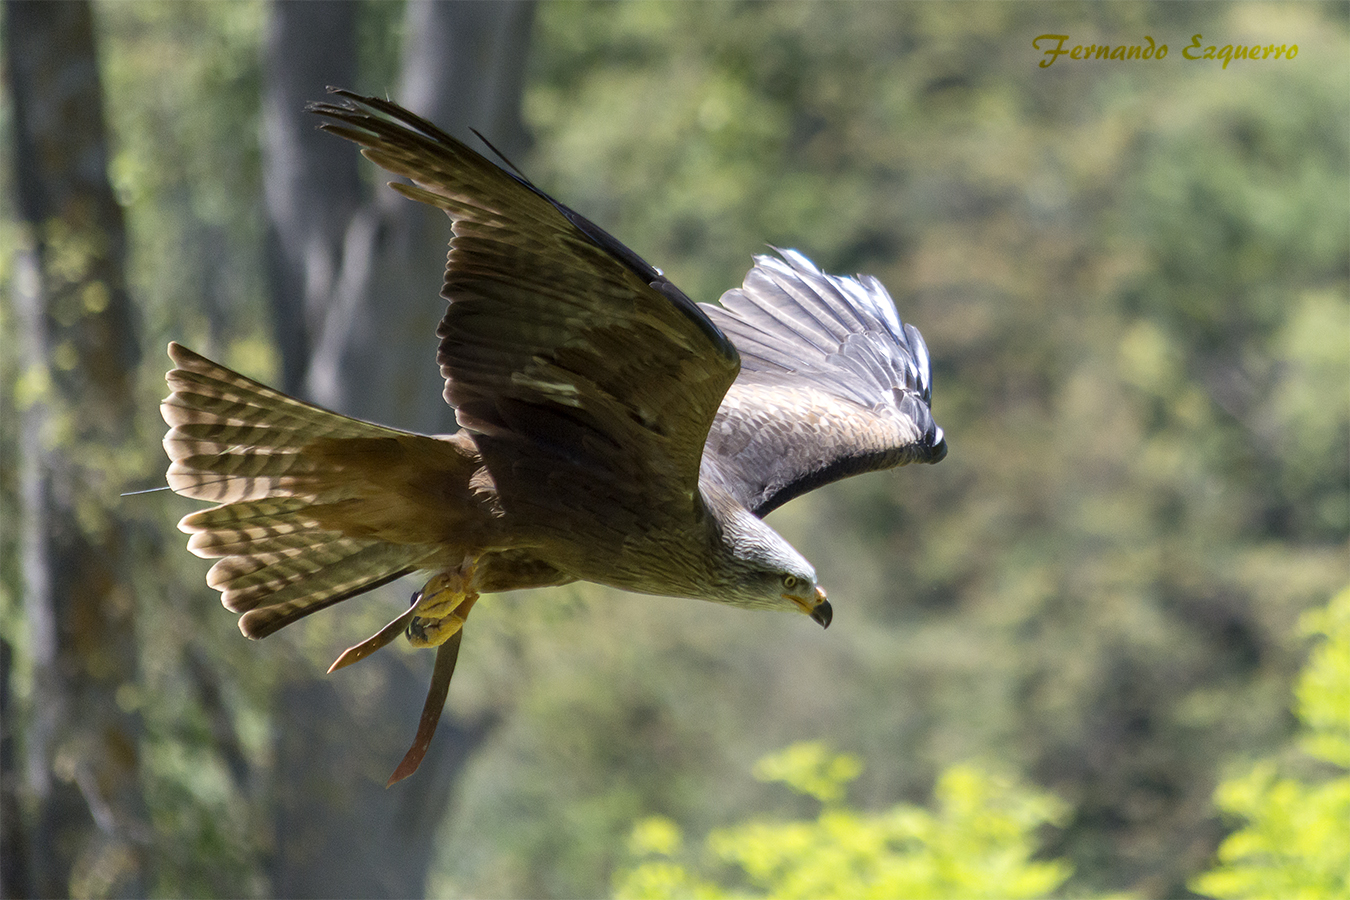 Exhibición de Vuelo de Aves Rapaces